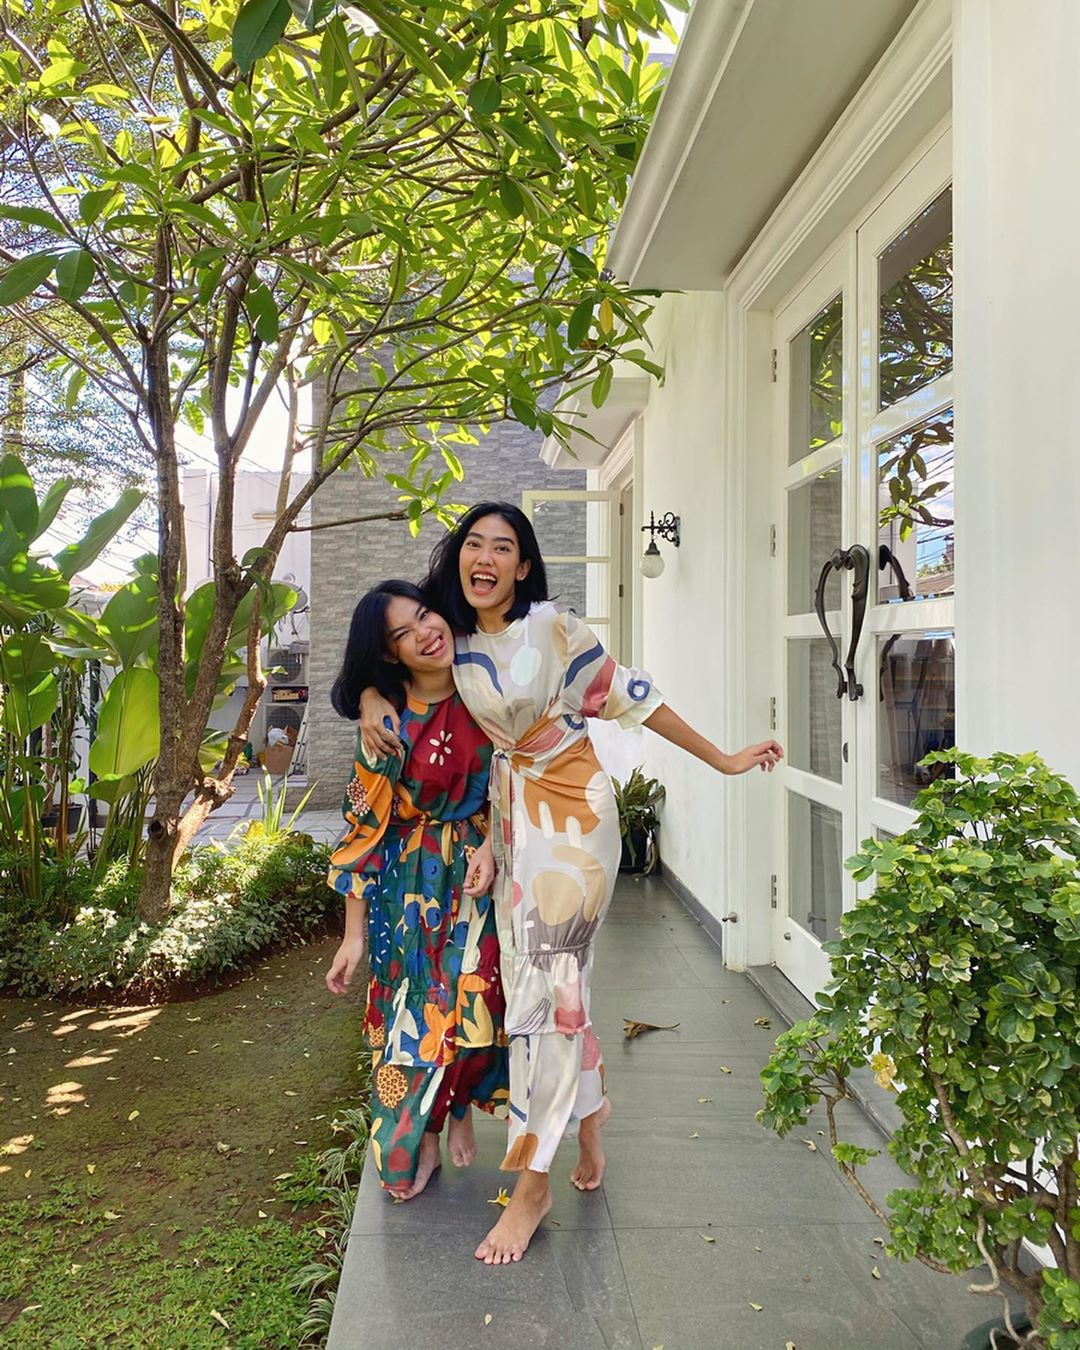 Mewah Hingga Sederhana, Intip Gaya Lebaran Selebgram Indonesia